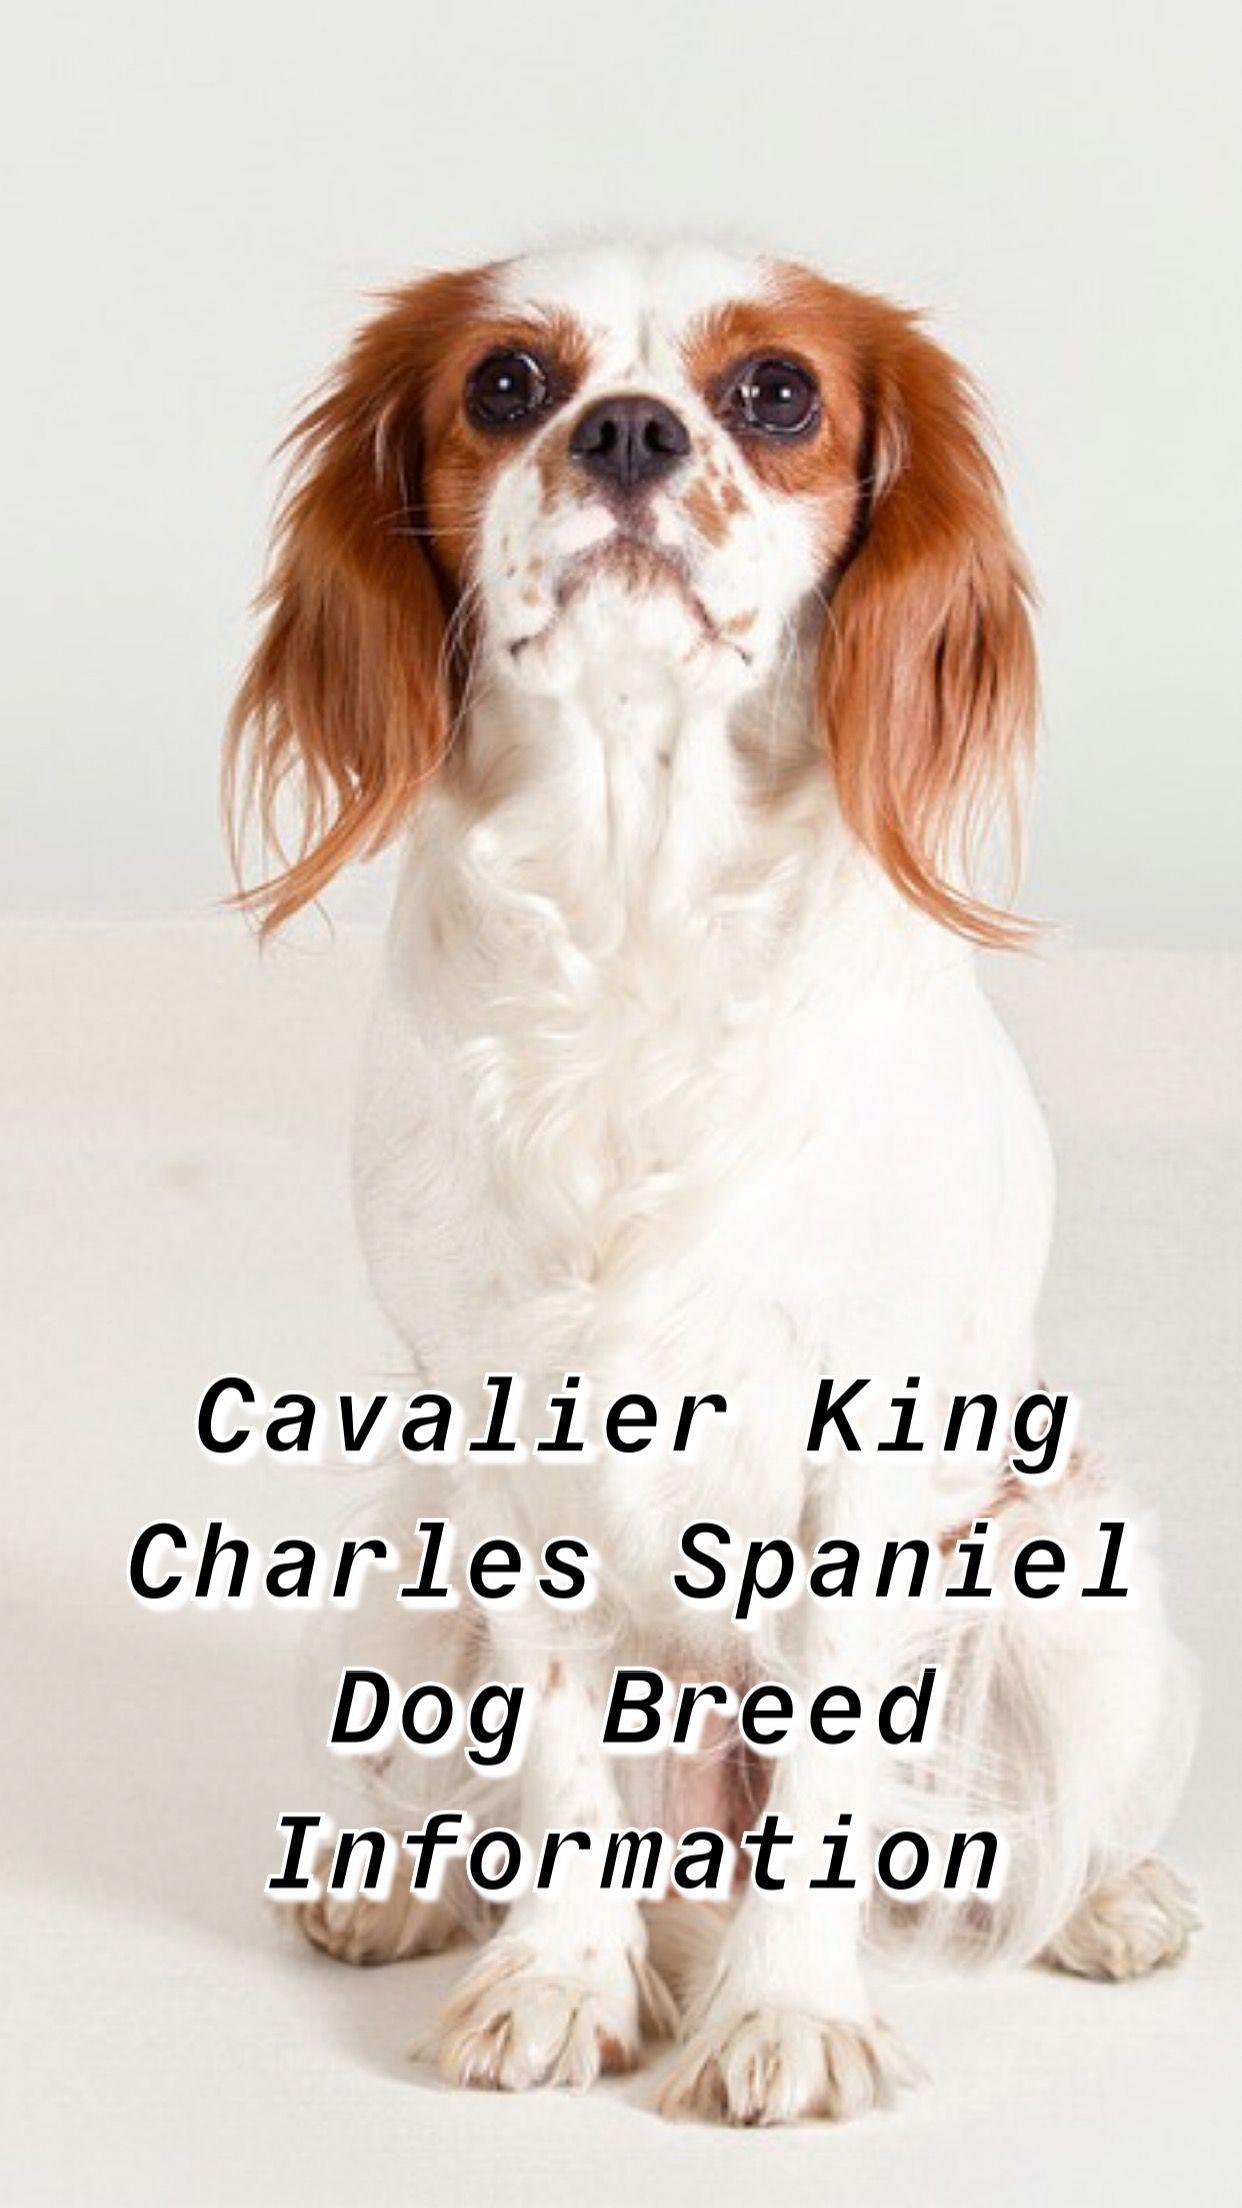 King Cavalier Cavalier King King Charles Spaniel Cavalier Cavalier King Charles King Charles Cavalier Spaniel Puppy Cavalier King Charles Dog King Charles Dog